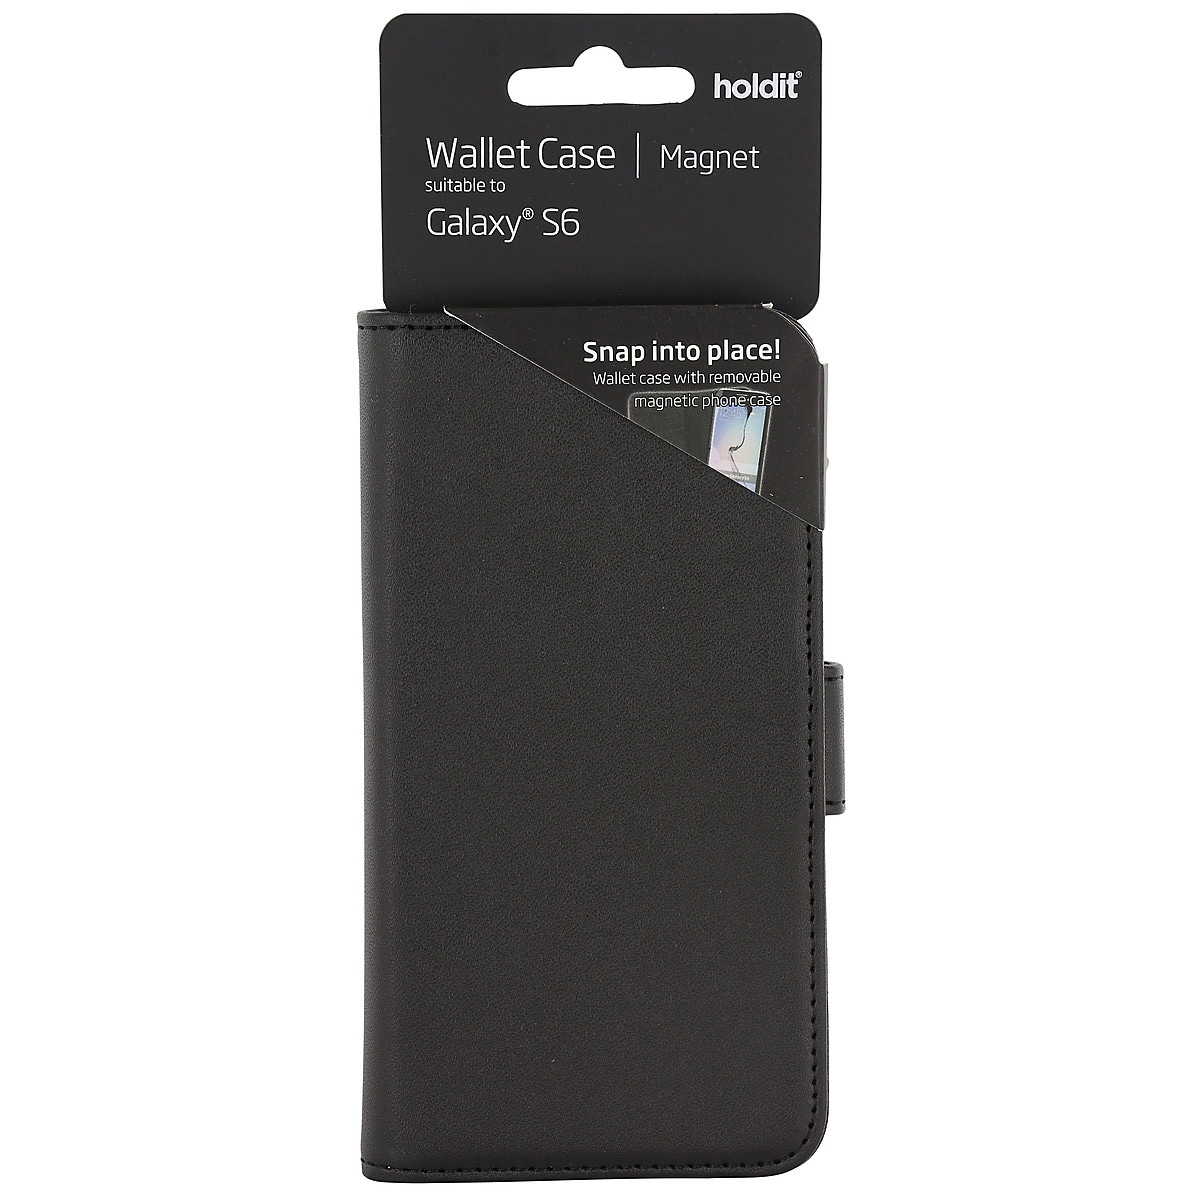 Lompakkokotelo Samsung Galaxy S6:lle, Holdit